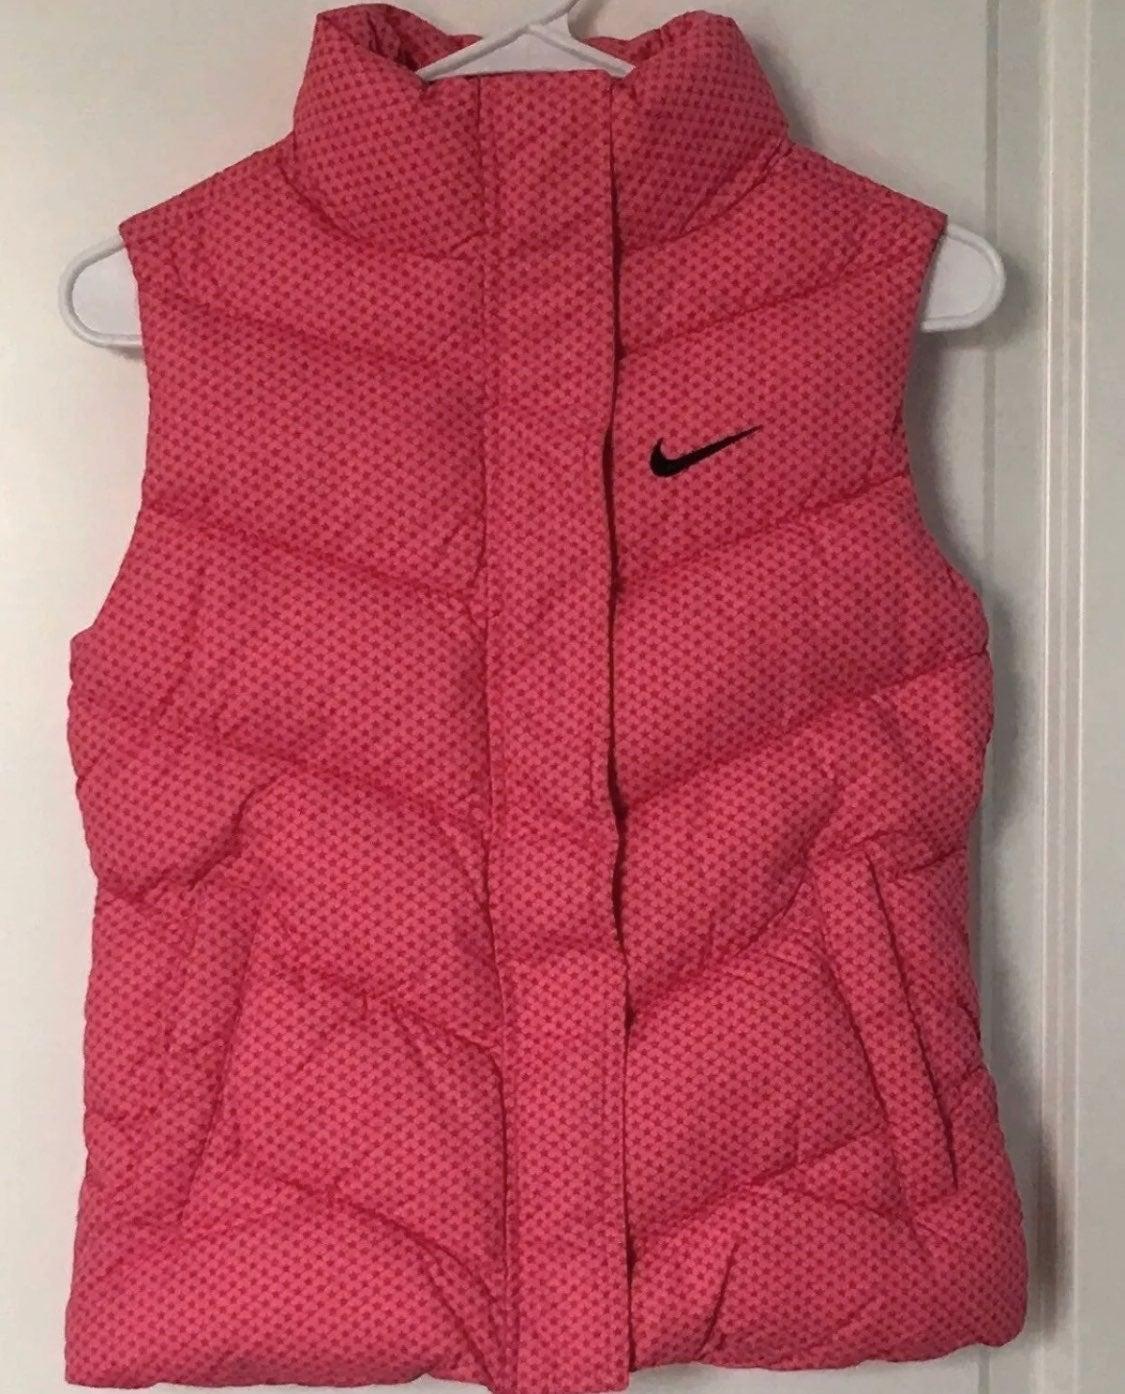 Nike Girls Size Small 8 Puffer Vest Pink